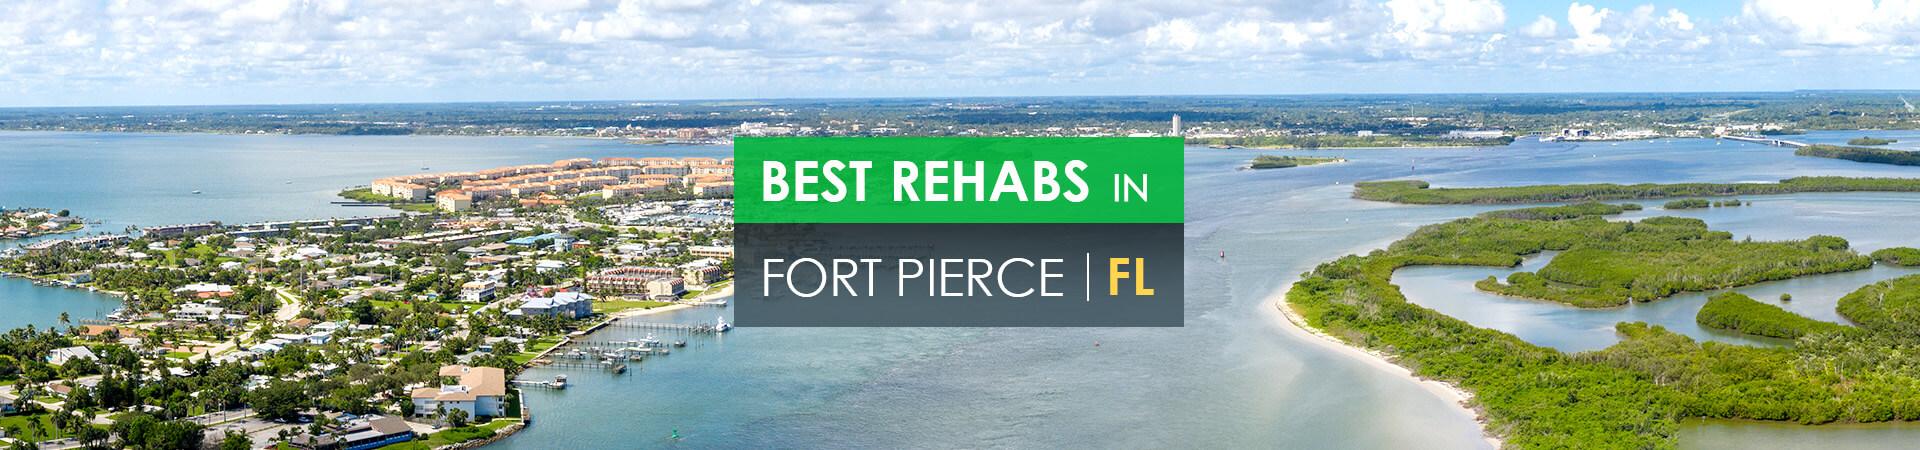 Best rehabs in Fort Pierce, FL